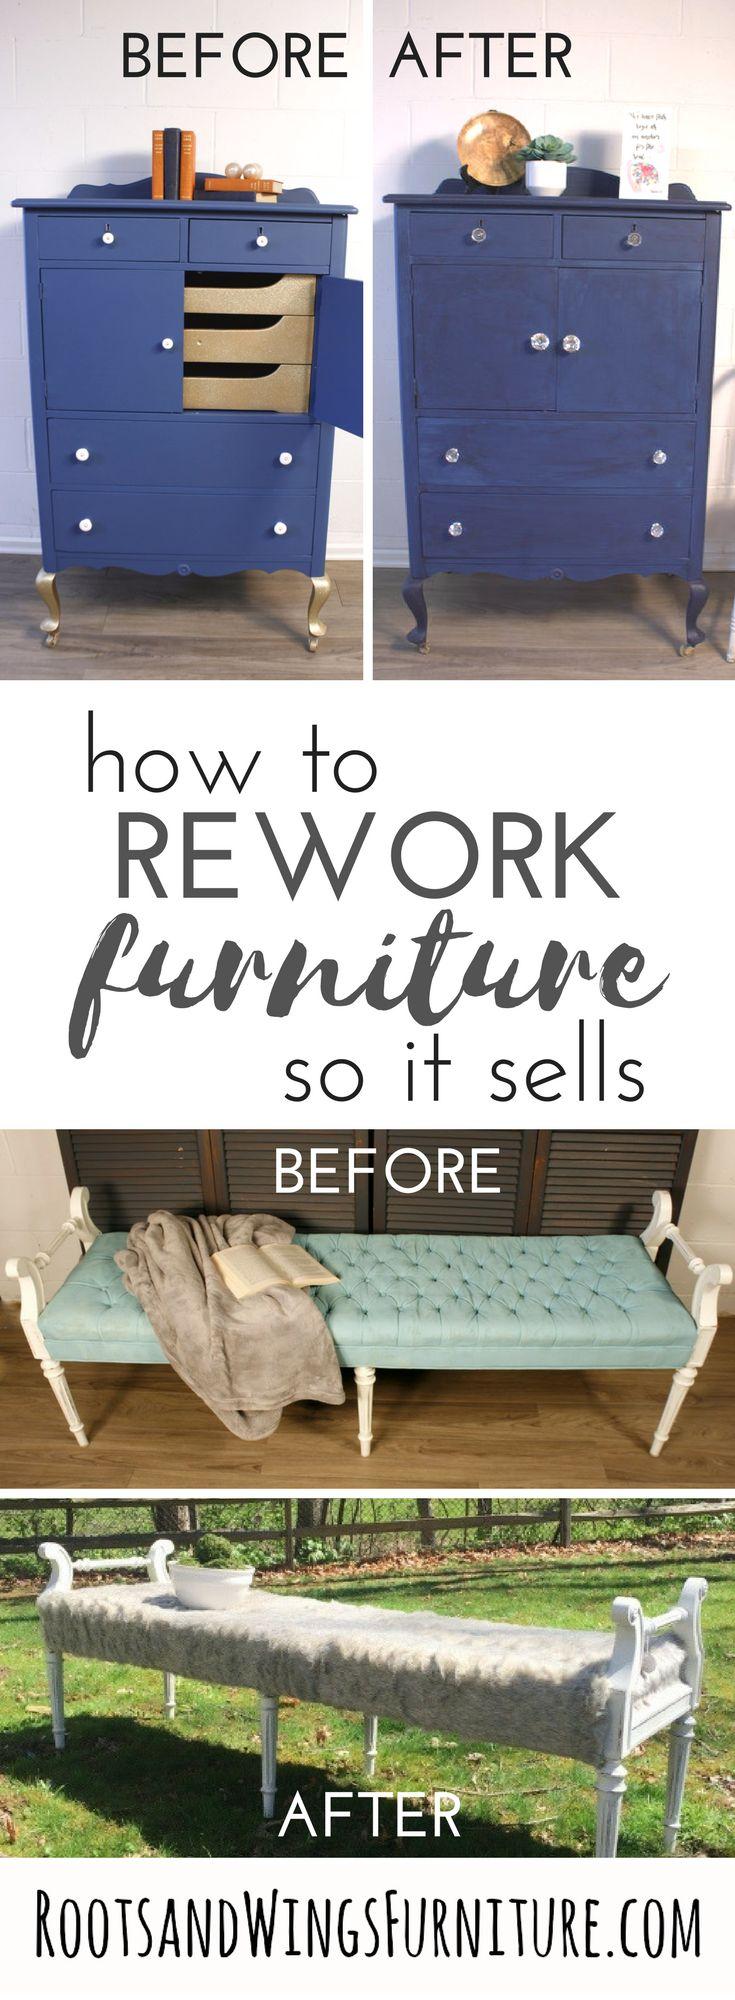 Re Work. Thrift Store FurnitureFurniture SaleRecycled FurnitureFurniture  IdeasPainting TipsPainting TechniquesRoots ...